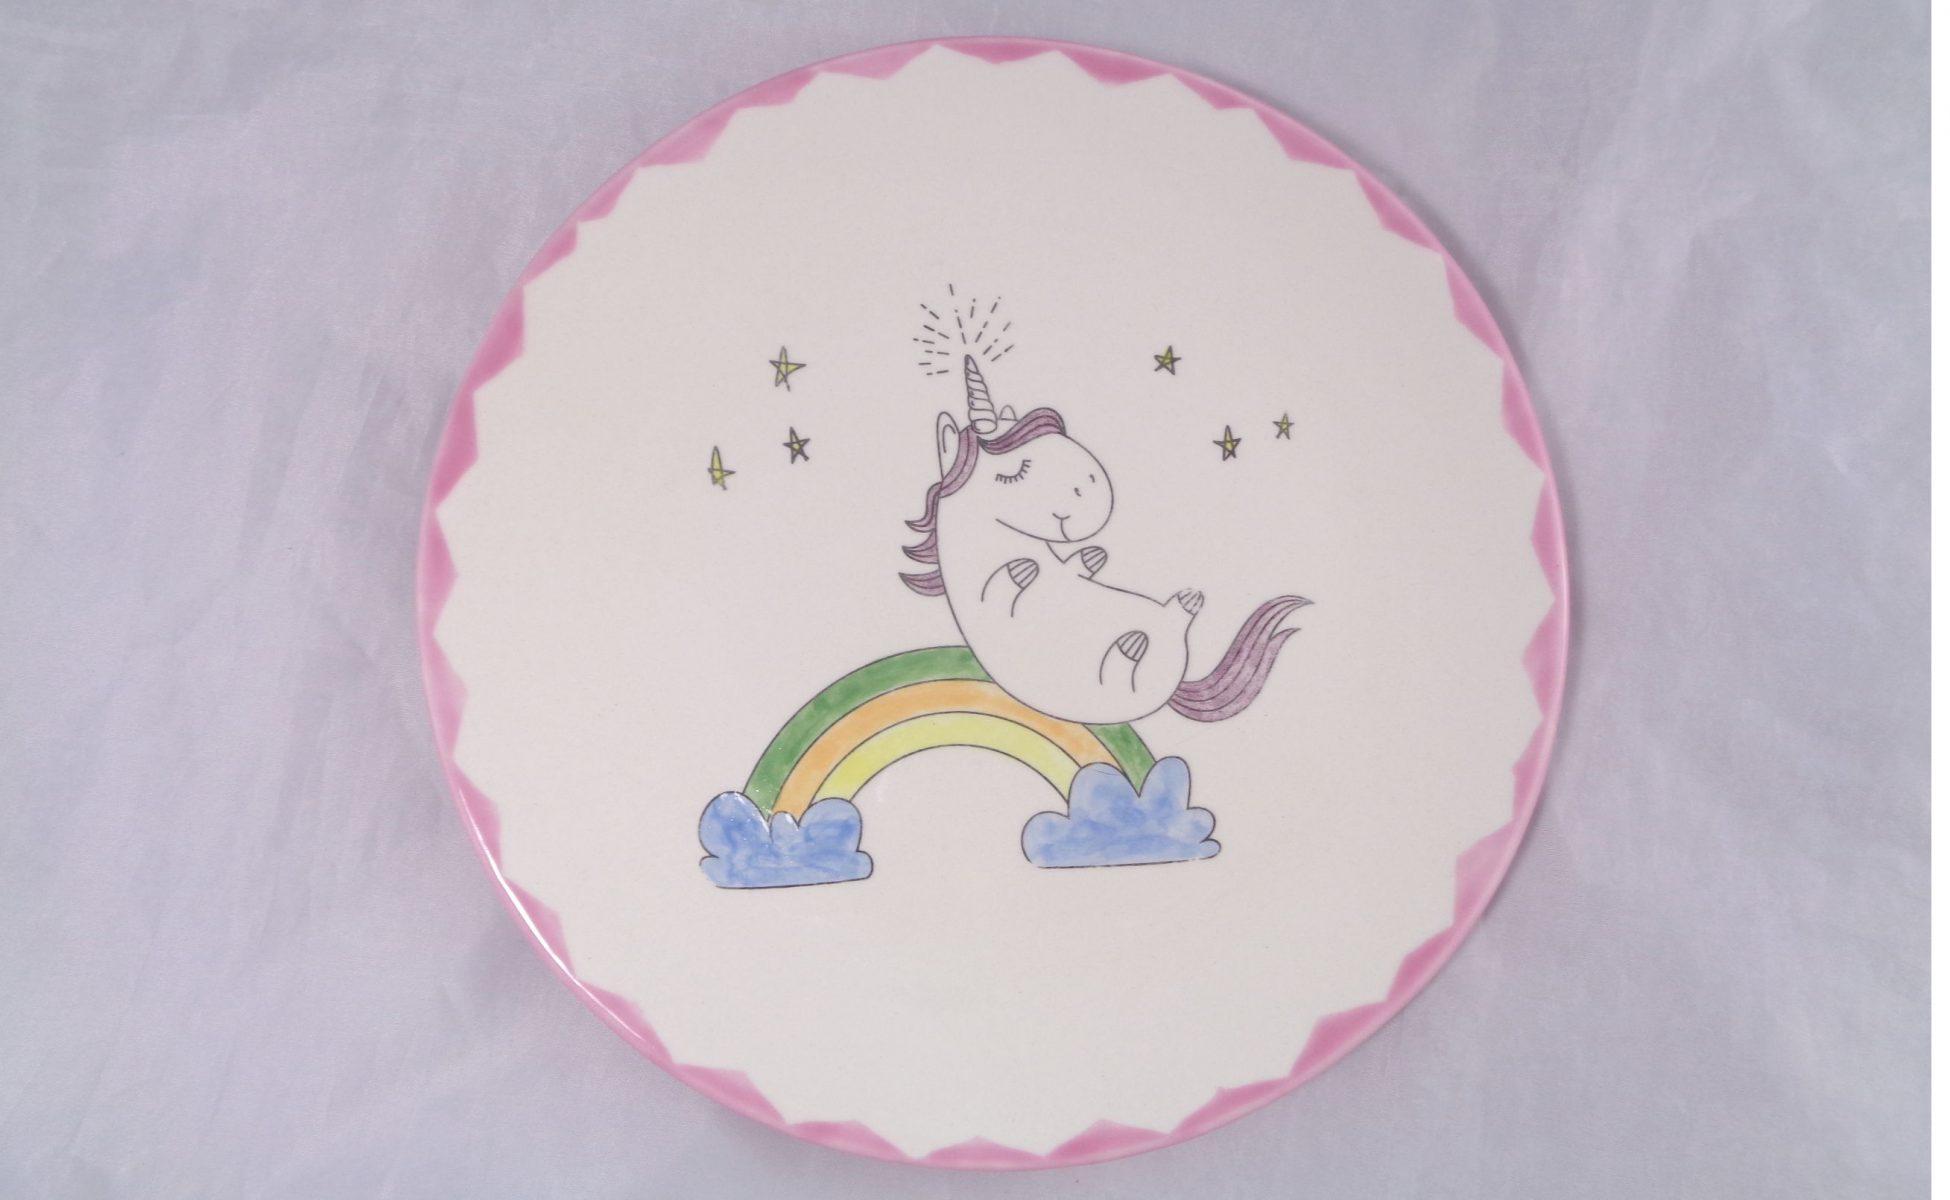 Bemalte Keramik Einhorn Teller Regenbogen